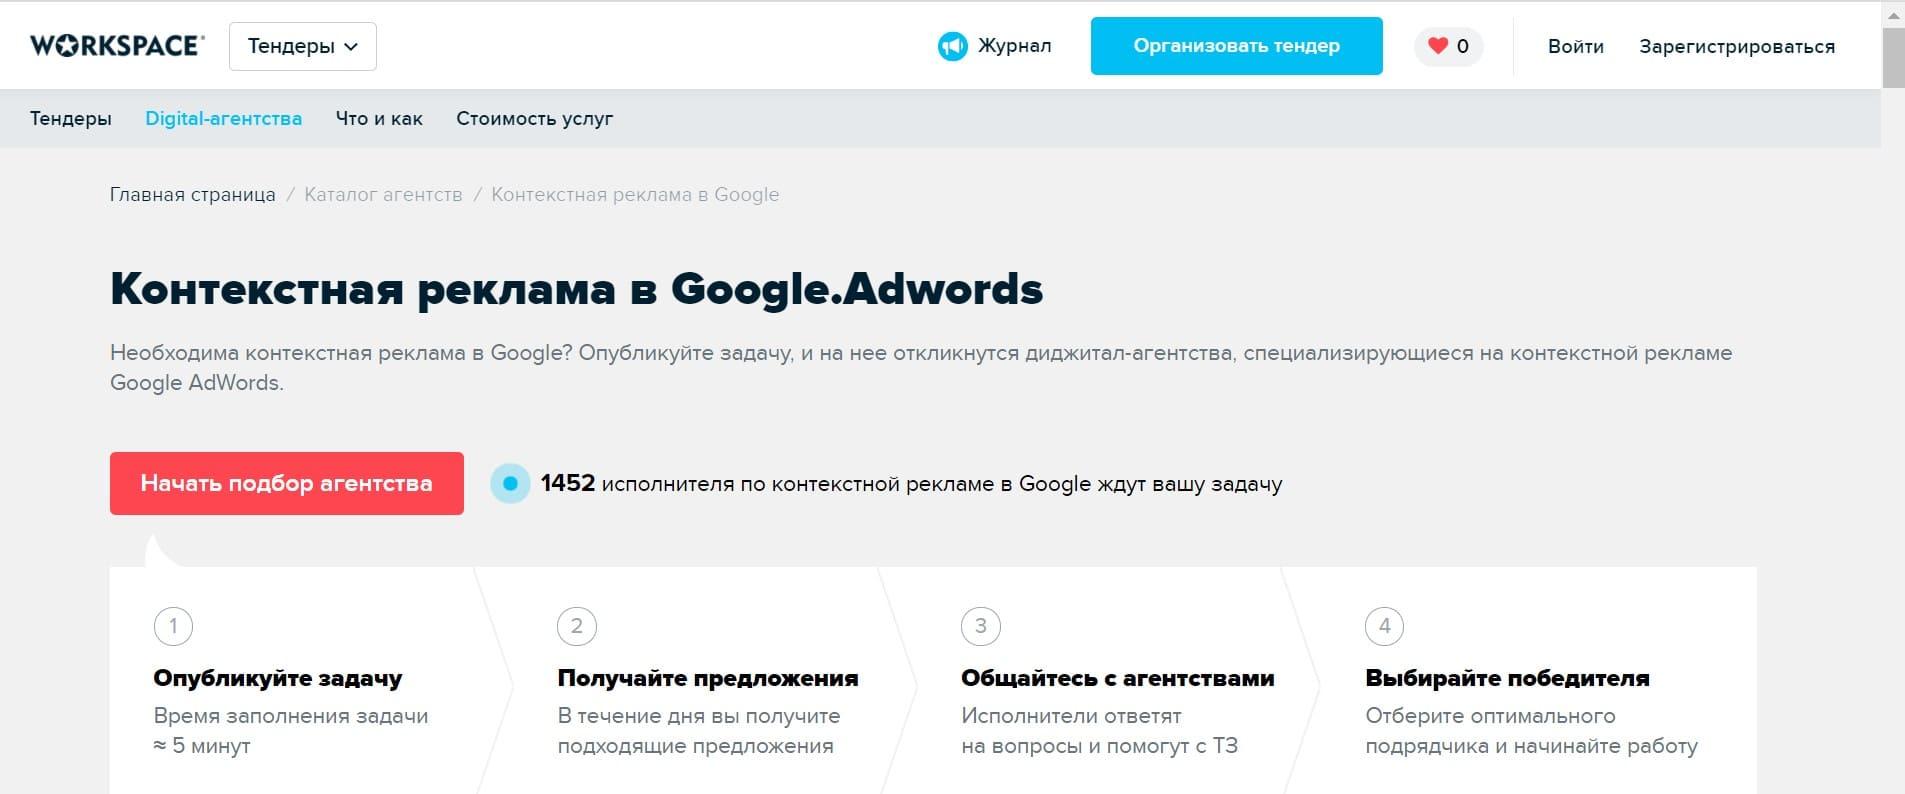 Находим рекламное агентство через онлайн тендер